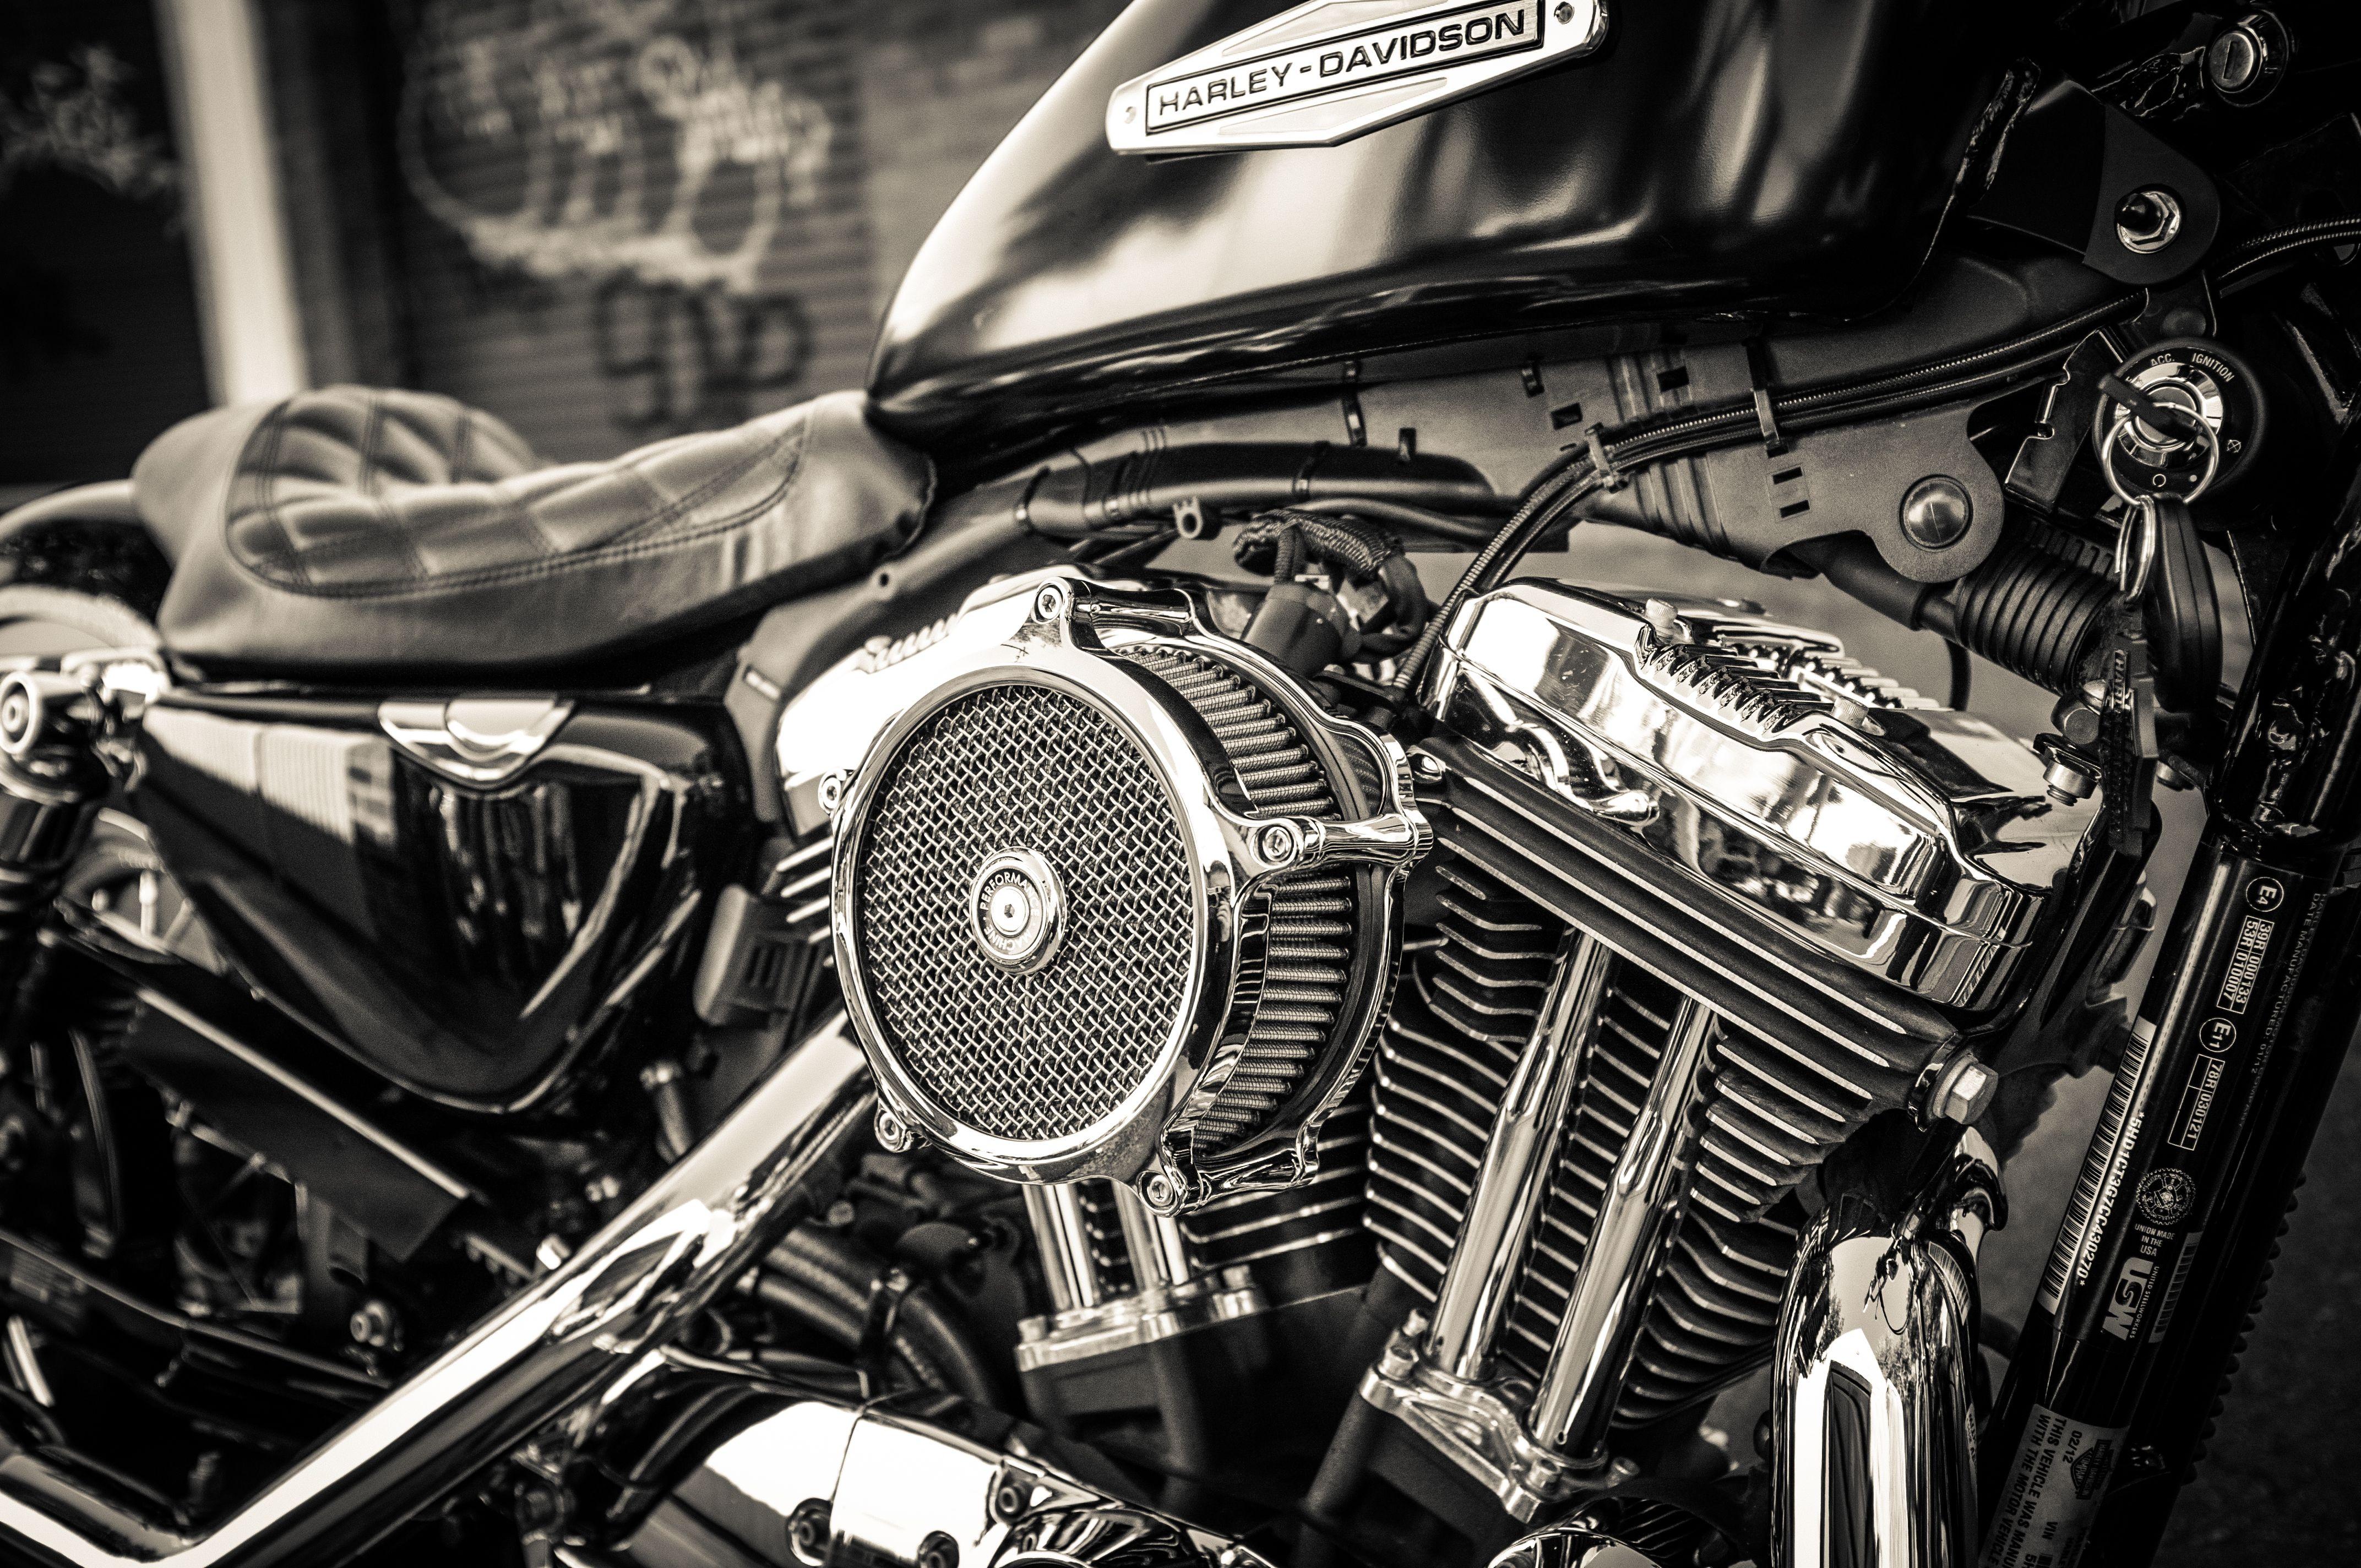 12' HarleyDavidson Sportster XL1200C Build 14' Part 2